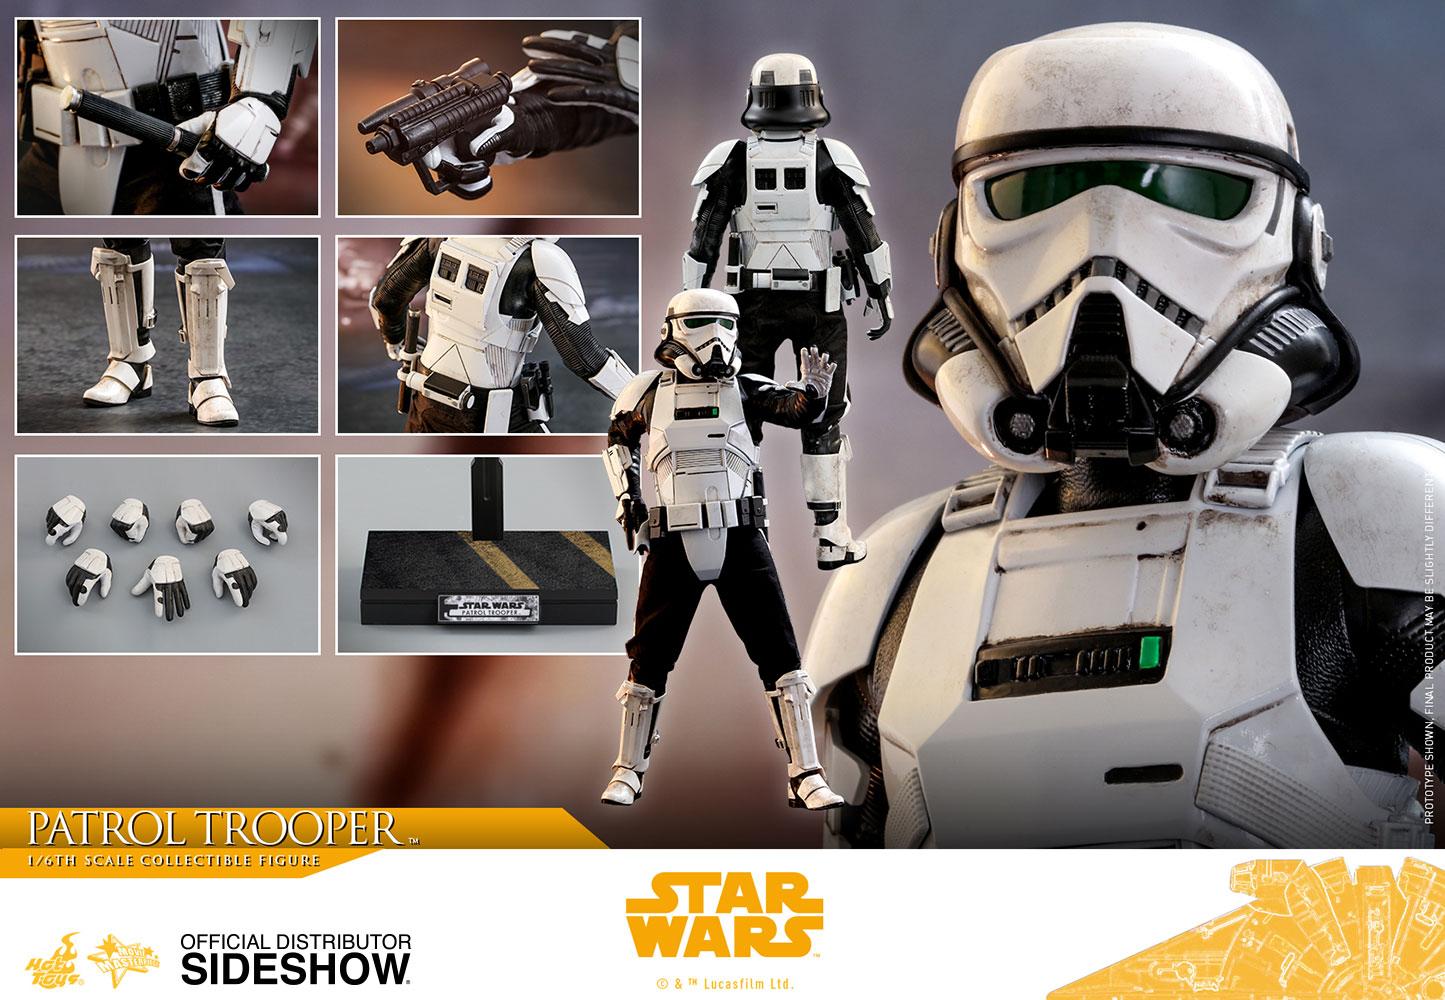 Imperial-Patrol-Trooper-sixth-scale-figure-09